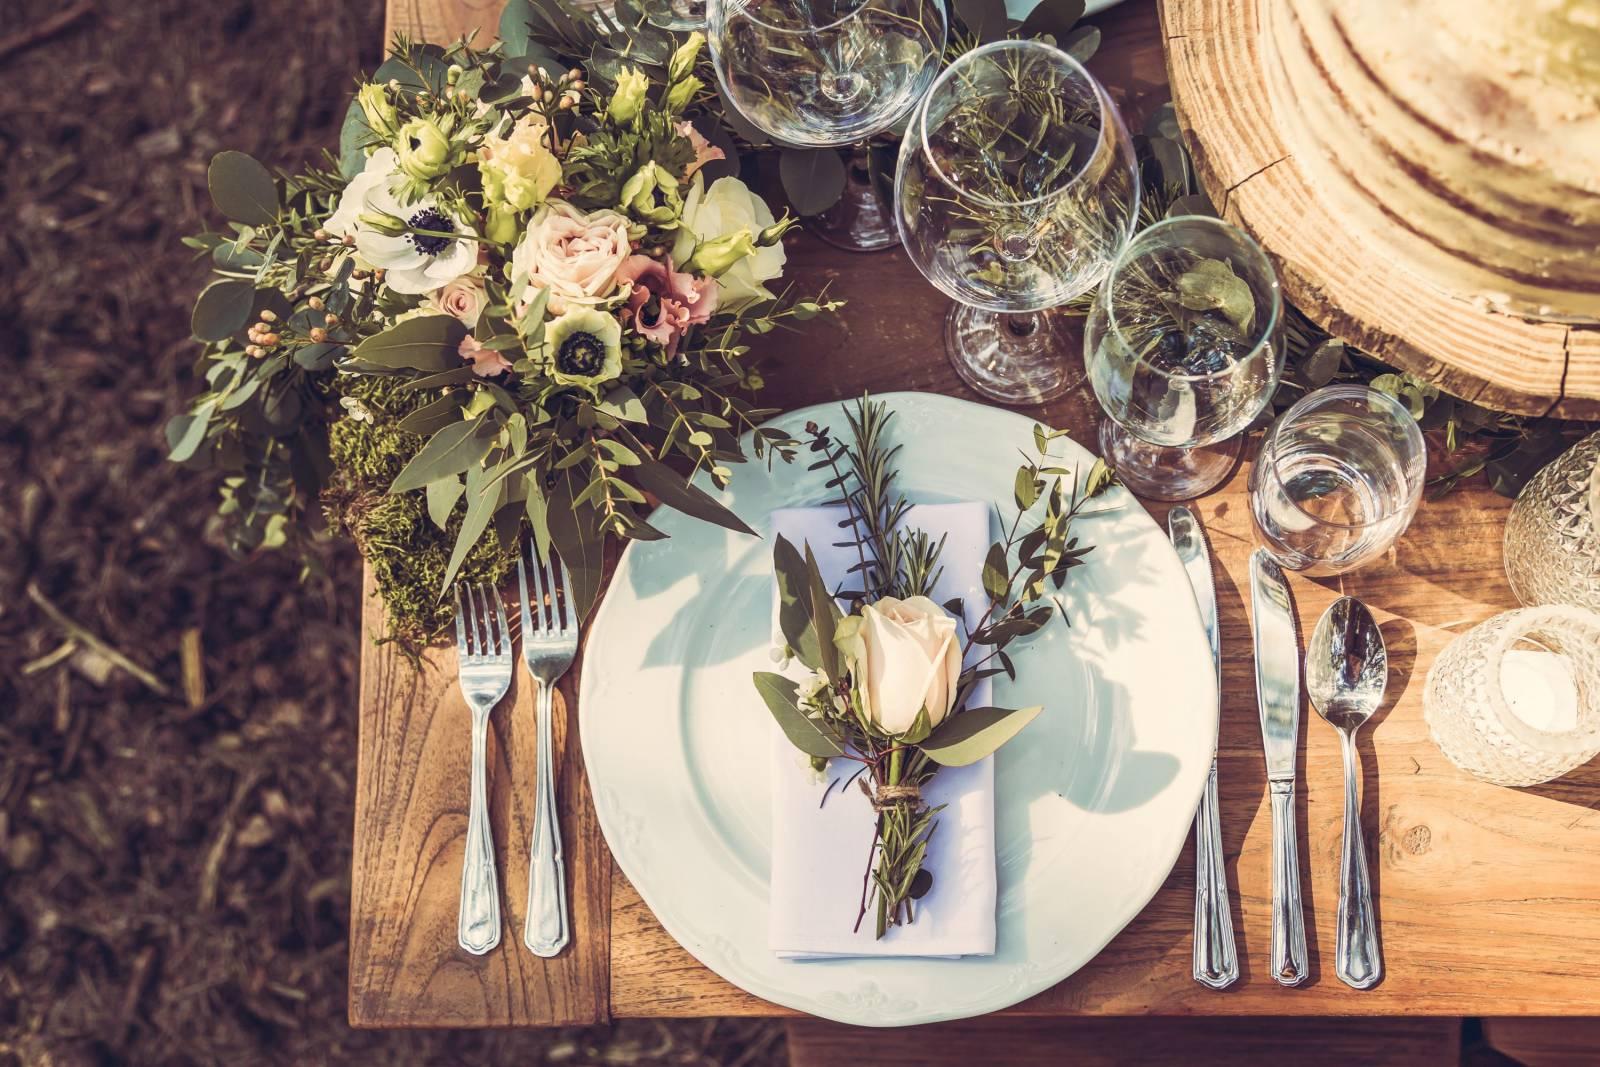 Carpe Diem Bloemen & Decoratie - House of Weddings  - 25